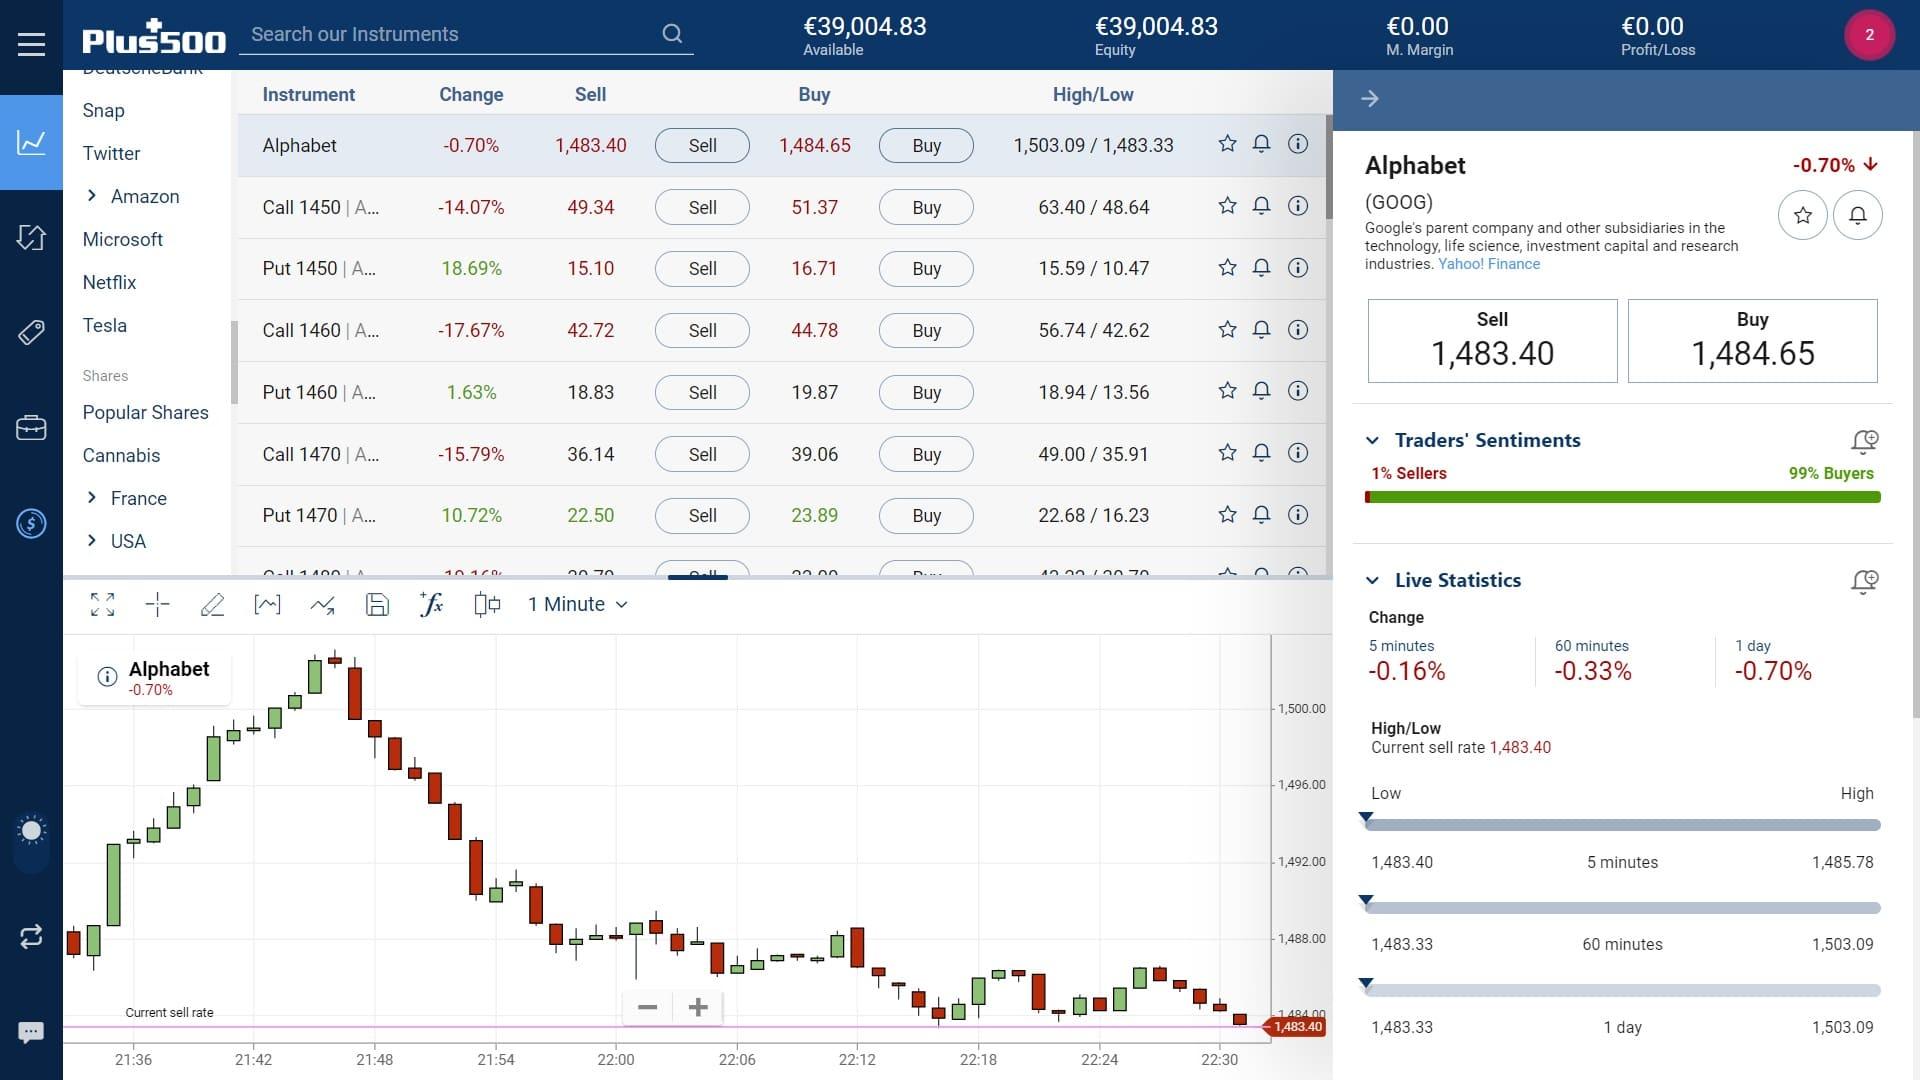 Google stock trading on Plus500's WebTrader platform